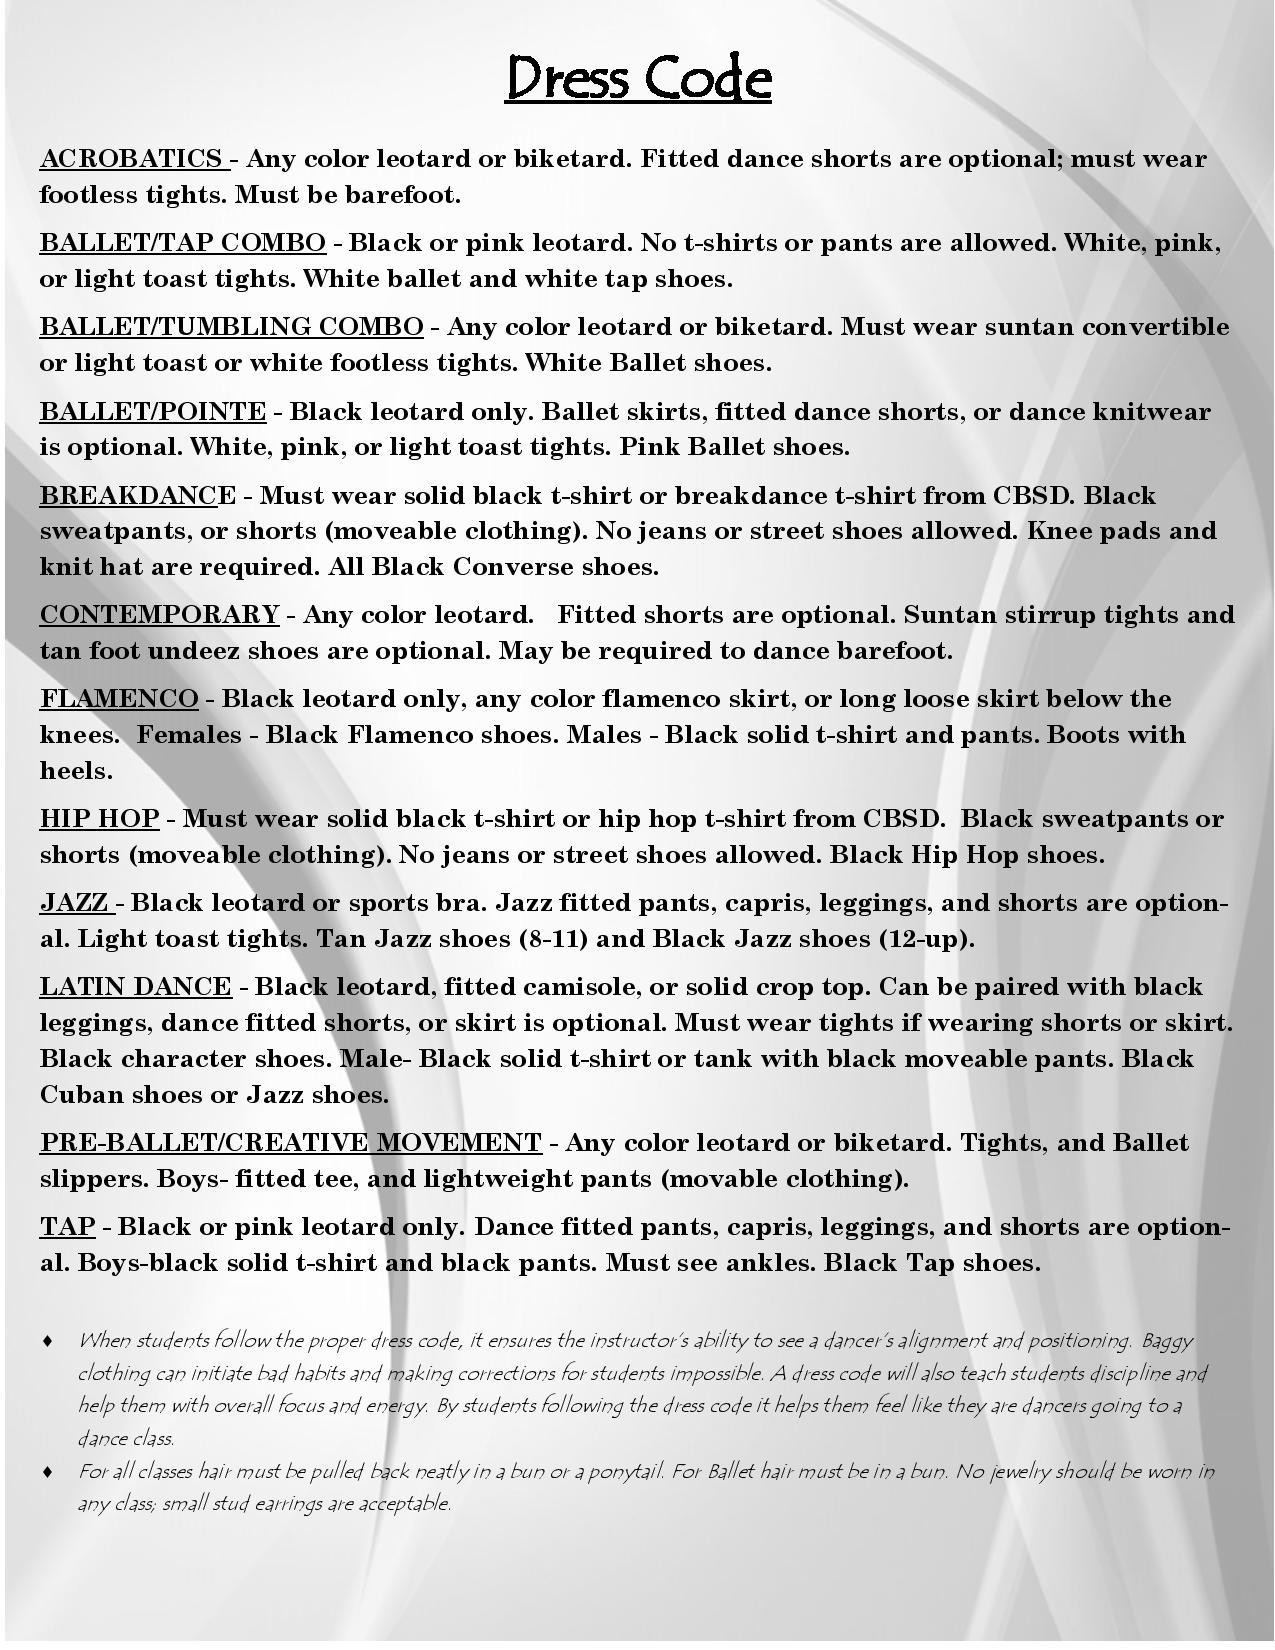 dress-code-2016-page-001-1